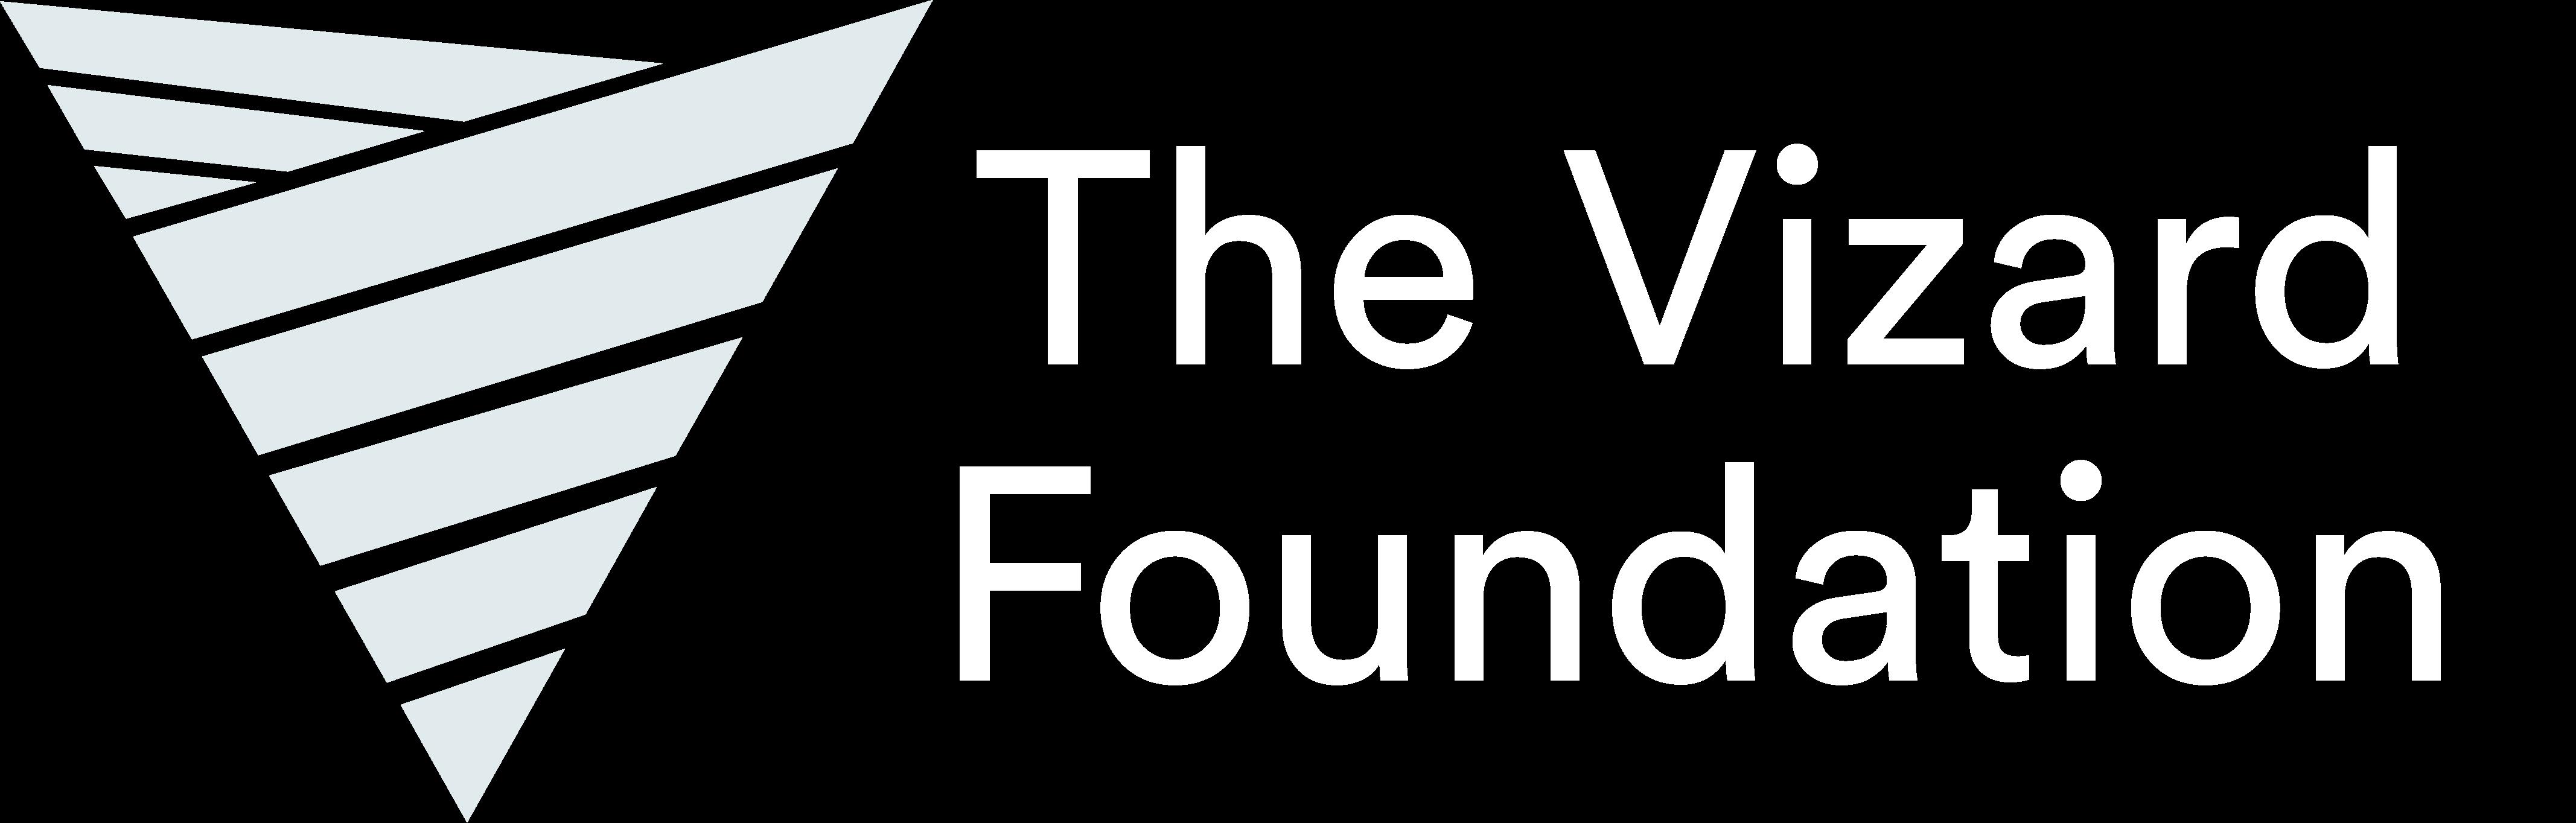 Vizard Foundation